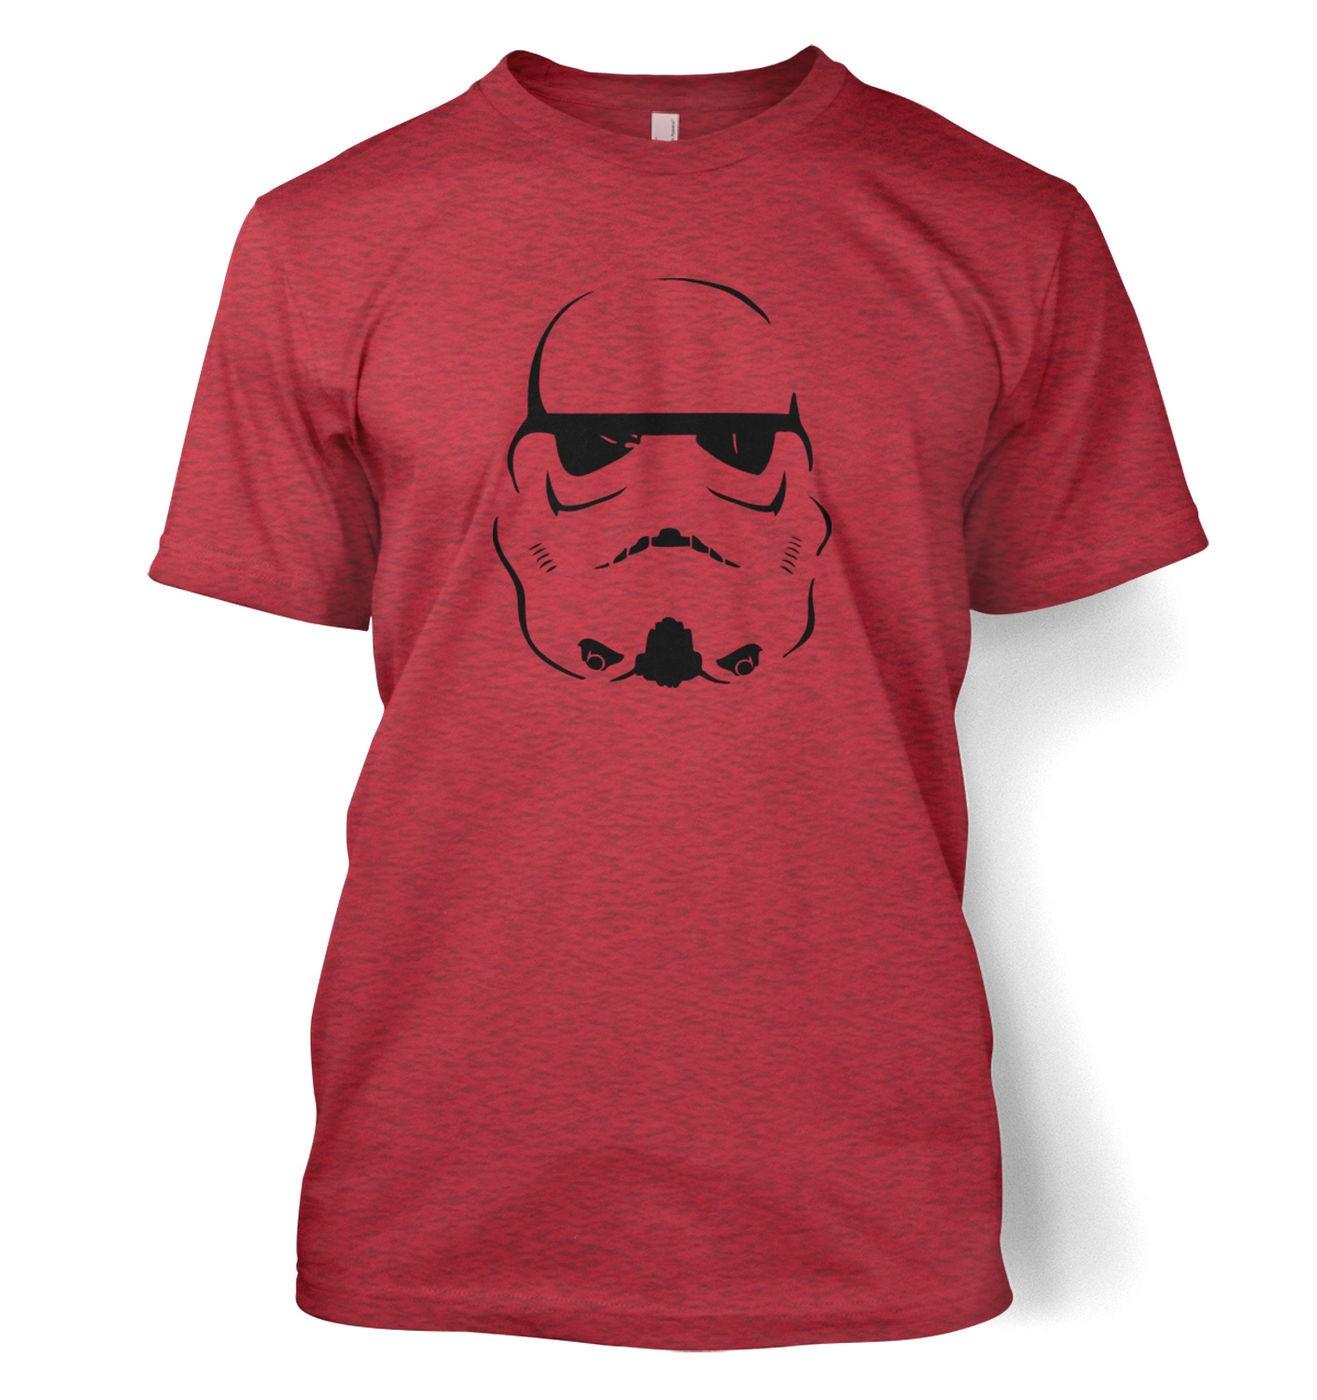 Trooper Helmet T-Shirt - Inspired by Star Wars